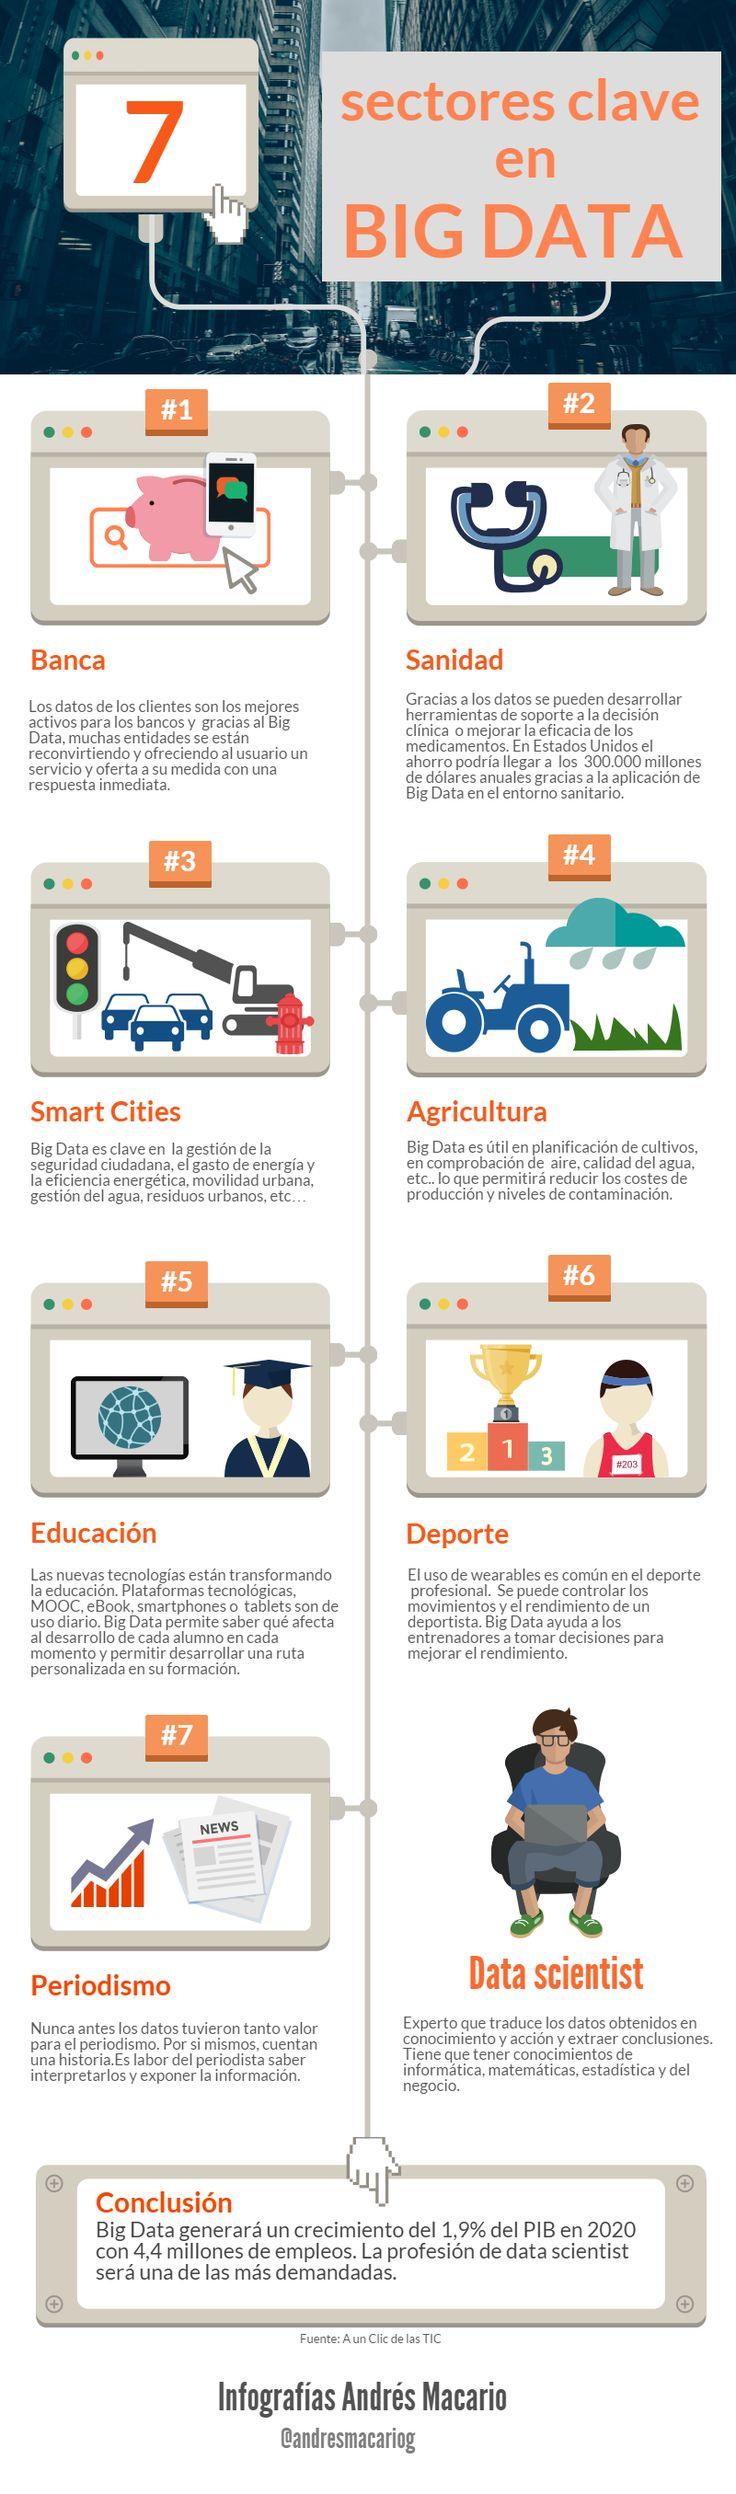 7 sectores clave en Big Data #infografia #infographic